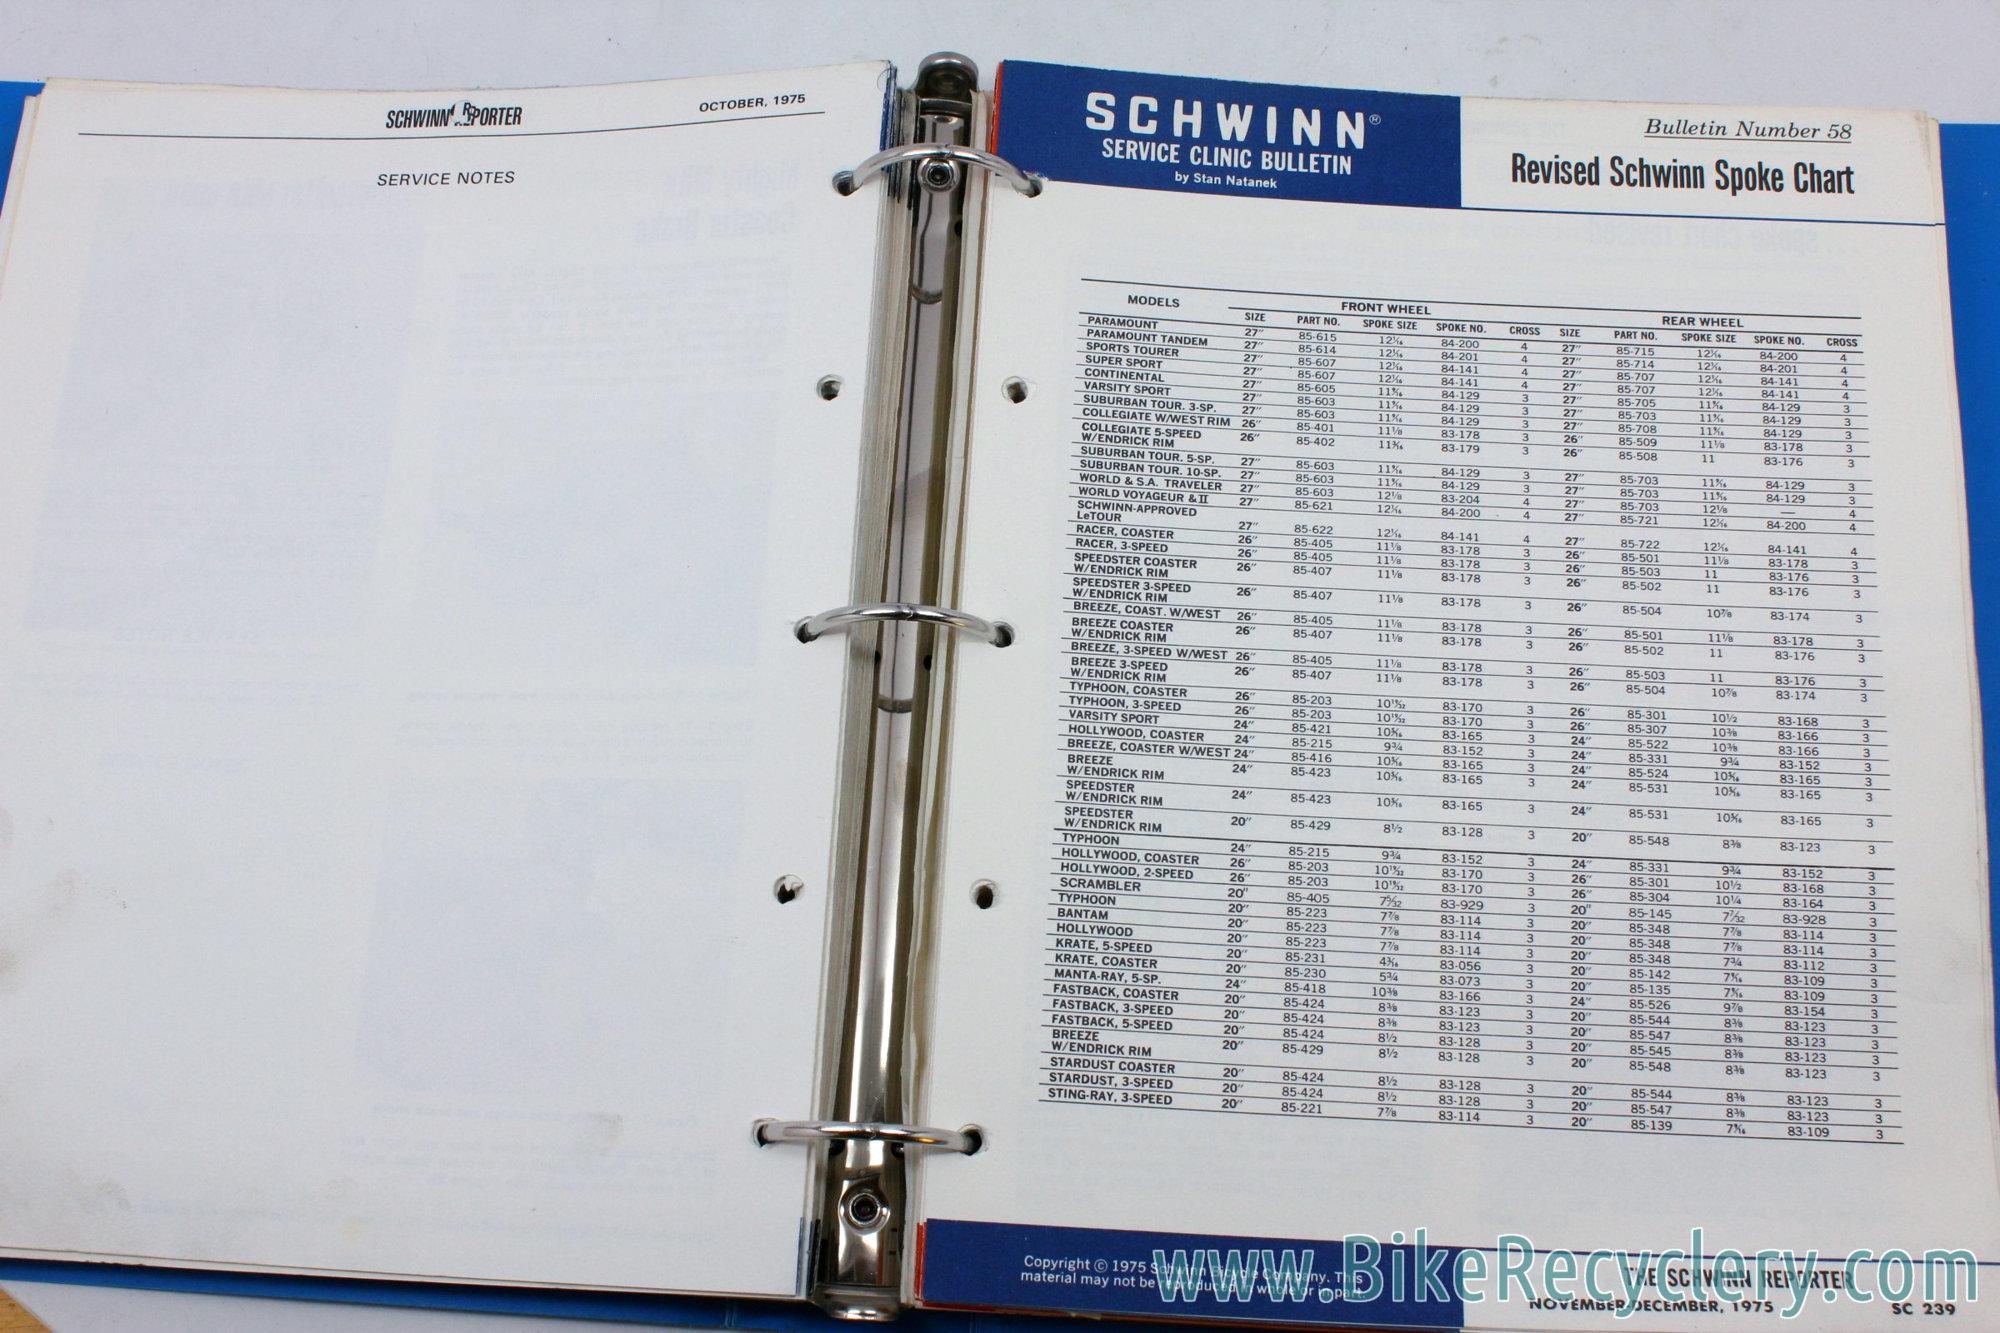 vintage_schwinn_memorabilia_catalogs_dealer_service_manuals_17767.JPG